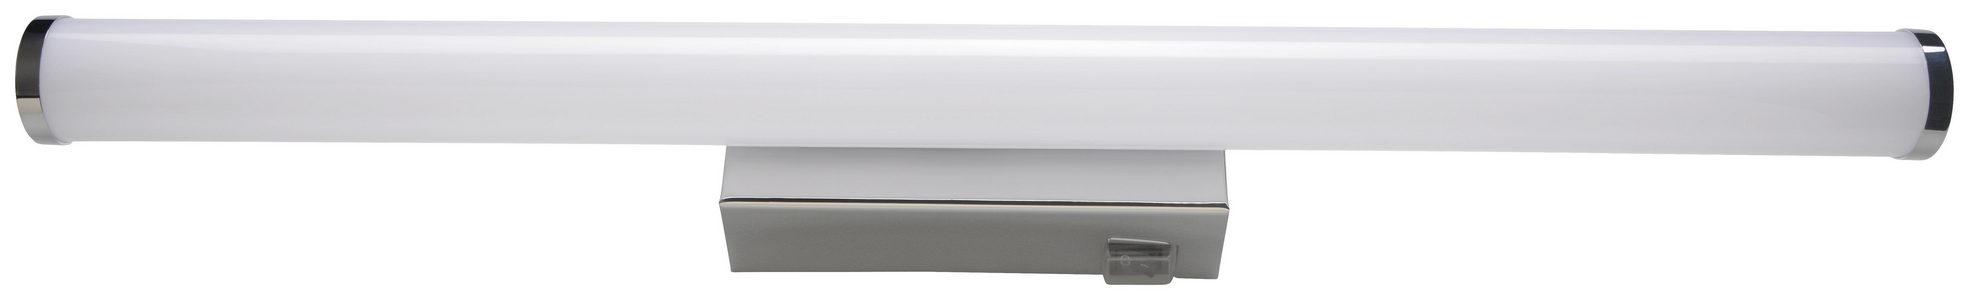 ZIDNA LED LAMPA - Bela, Konvencionalno, Plastika/Metal (60/6,5/8,5cm) - Celina